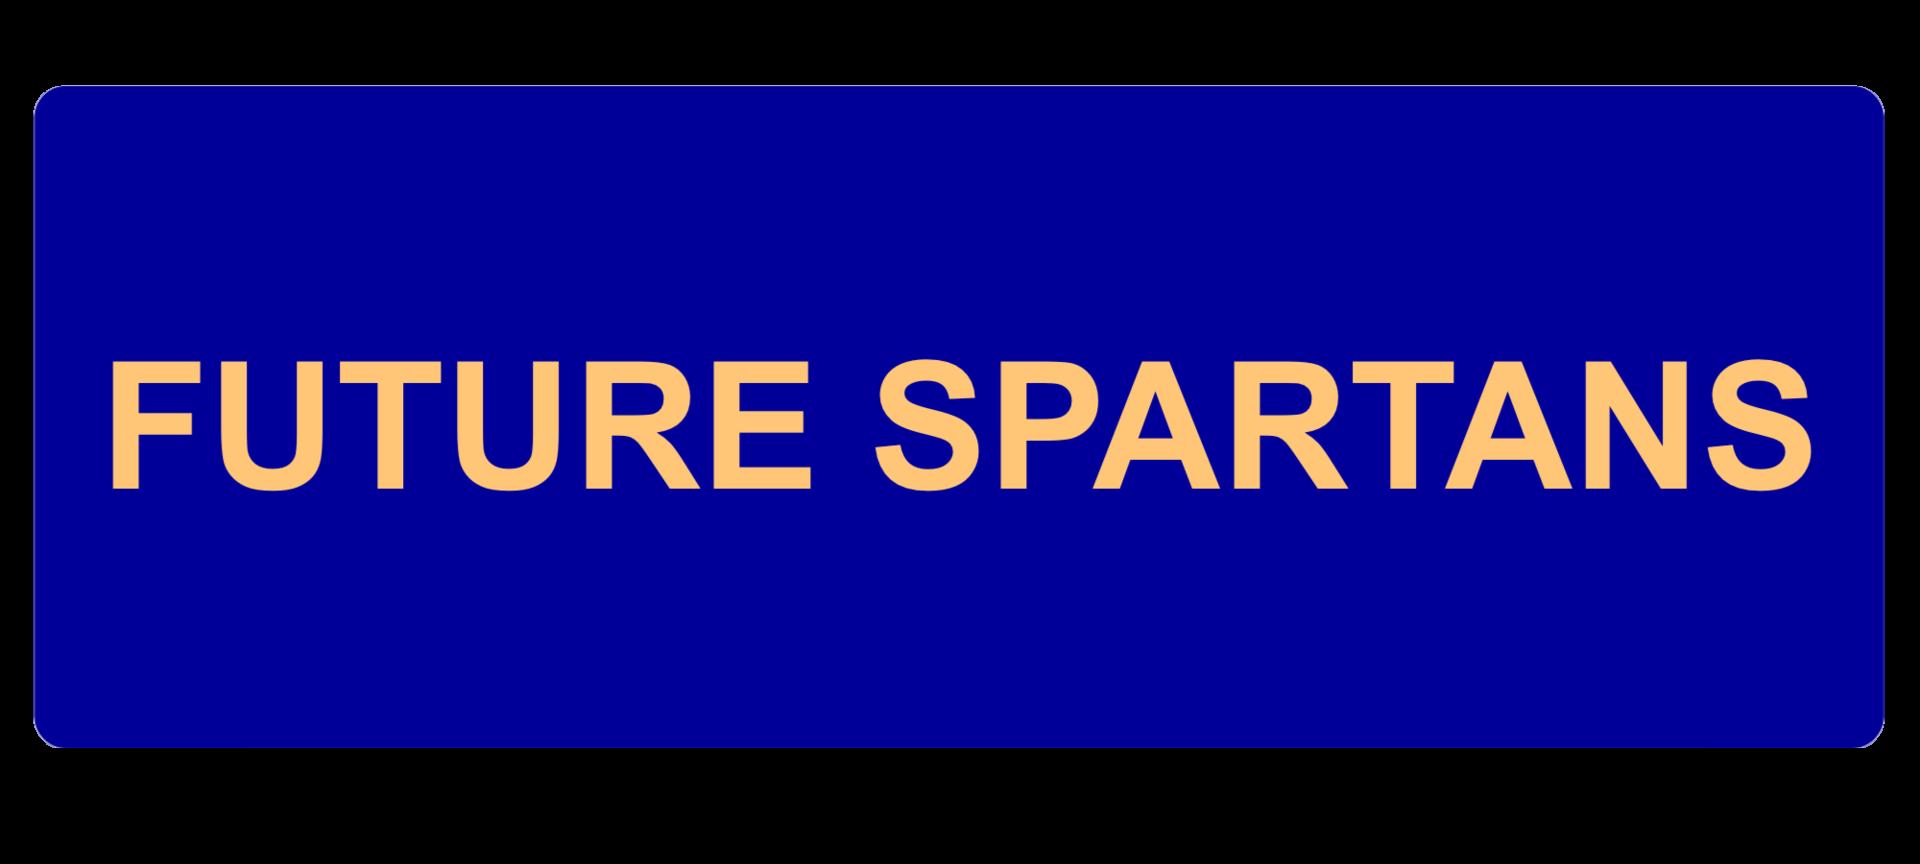 Future Spartans Contact Form